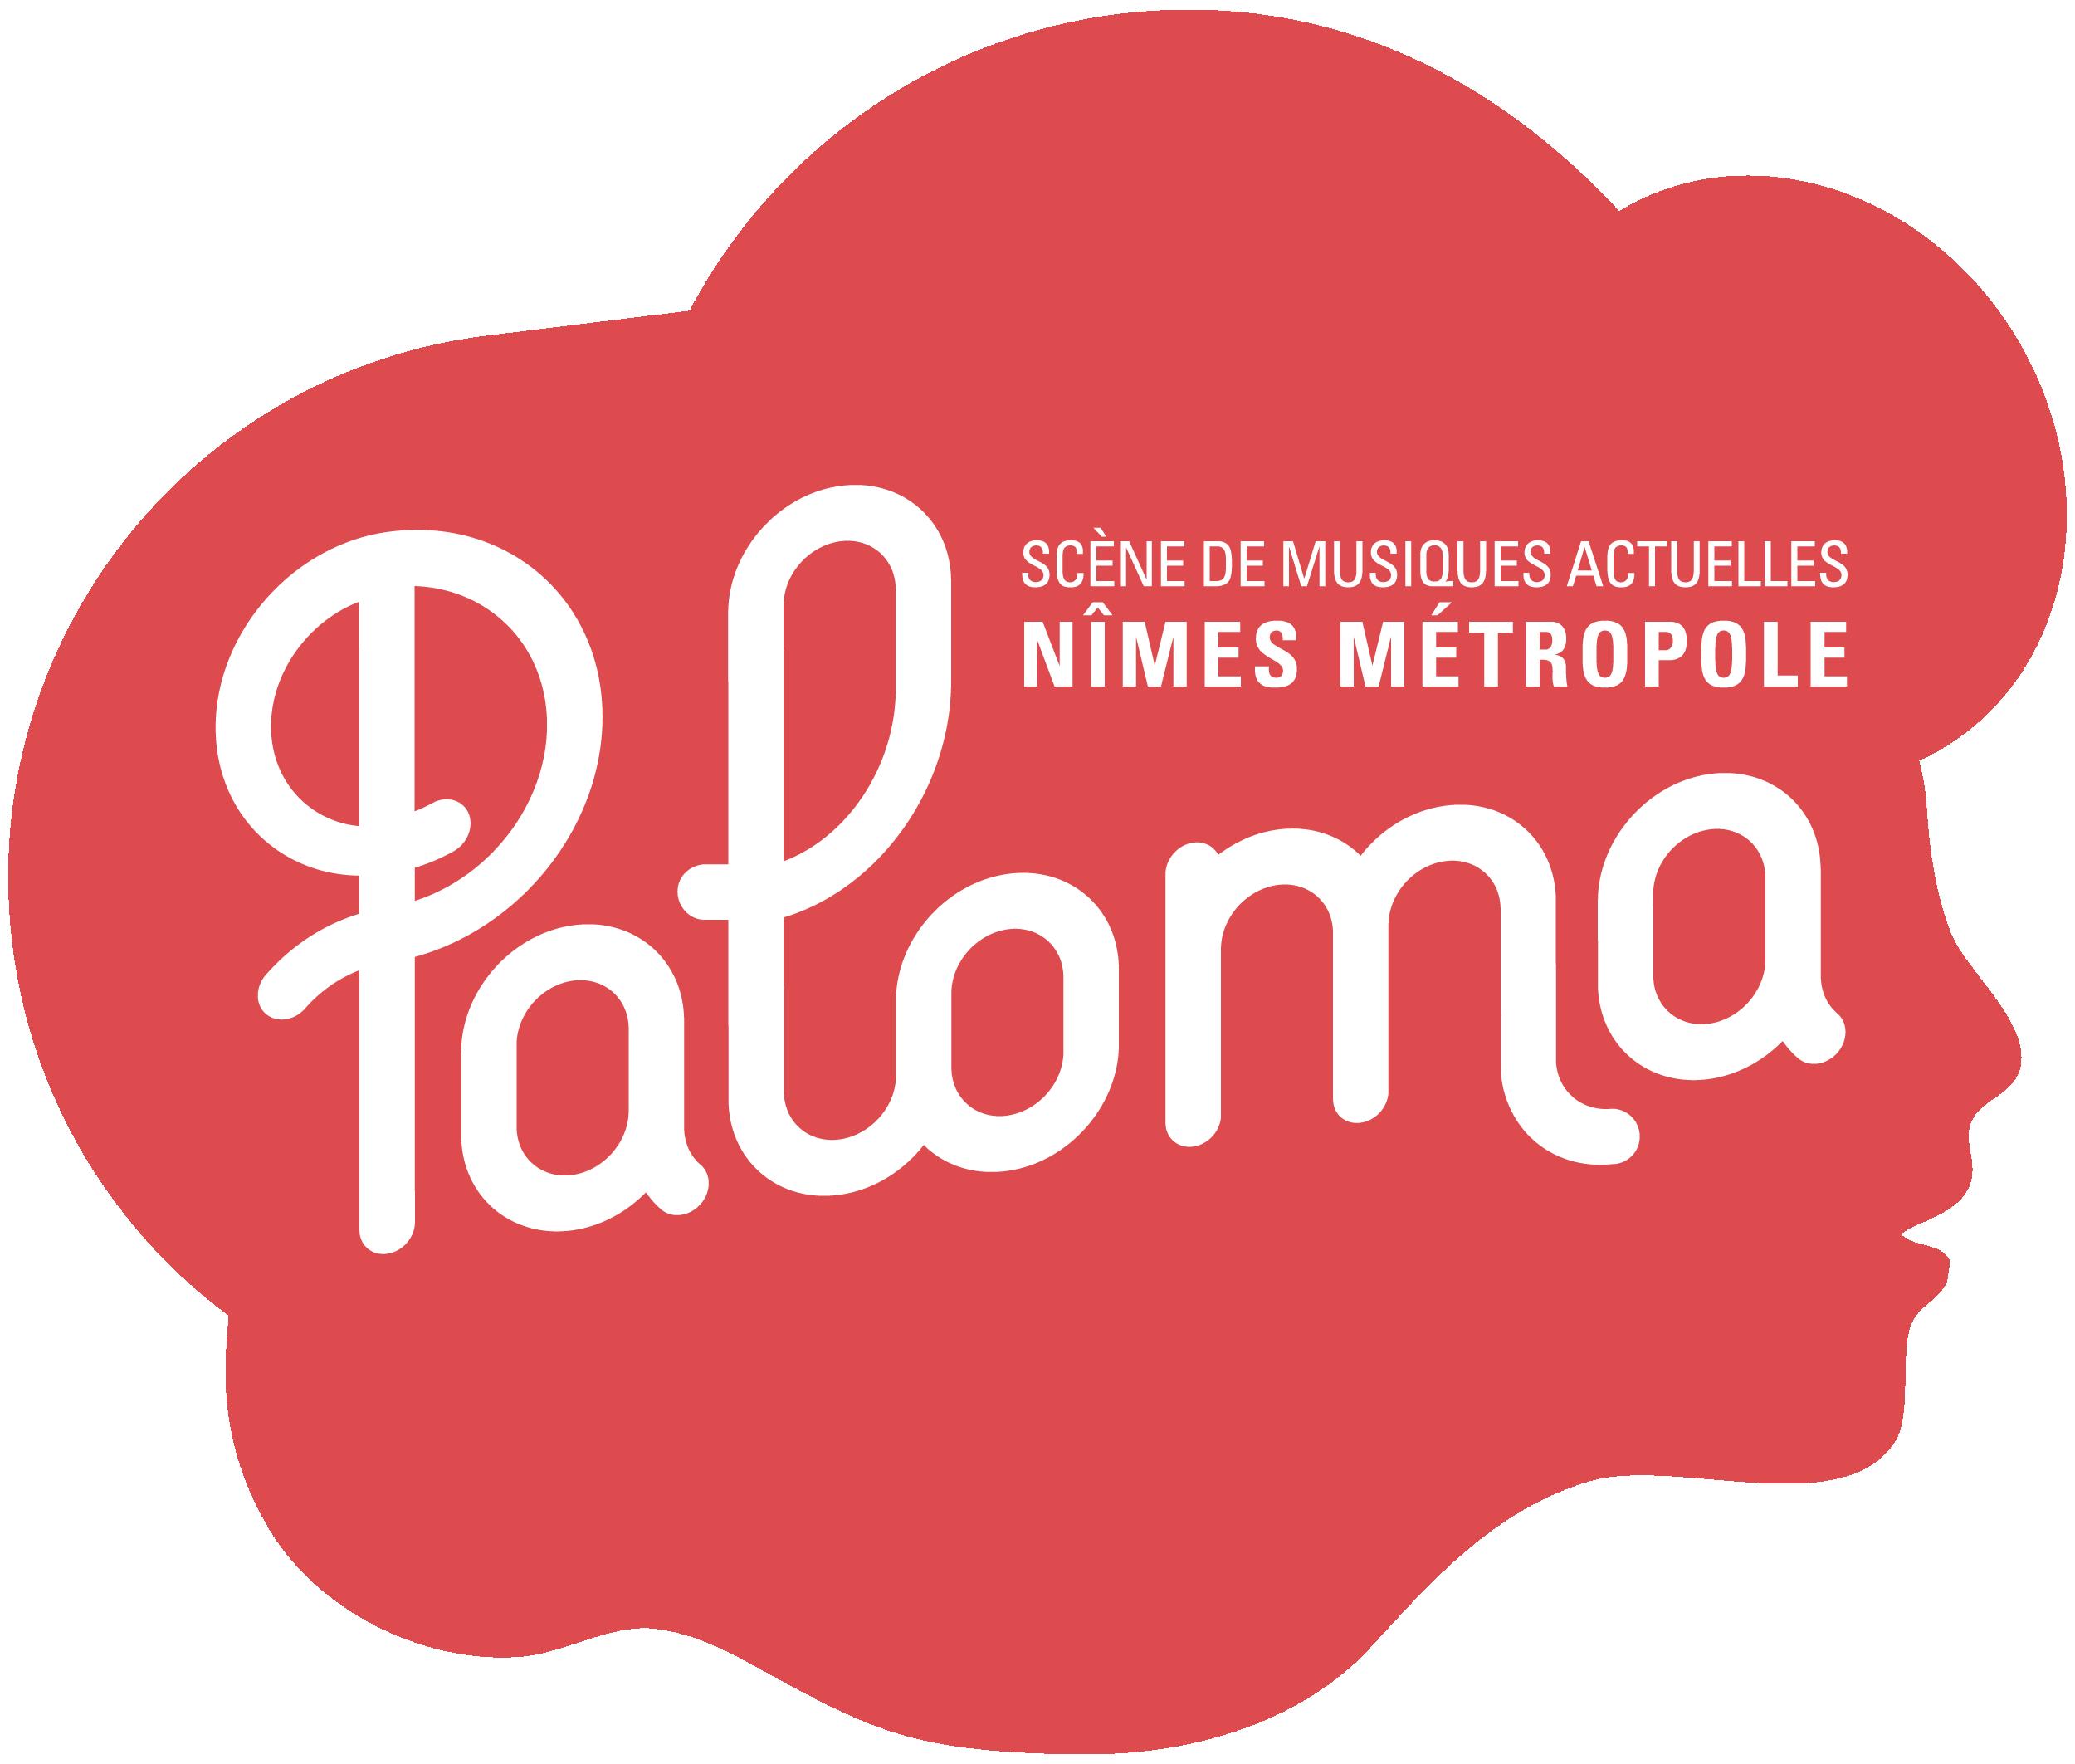 (c) Paloma-nimes.fr